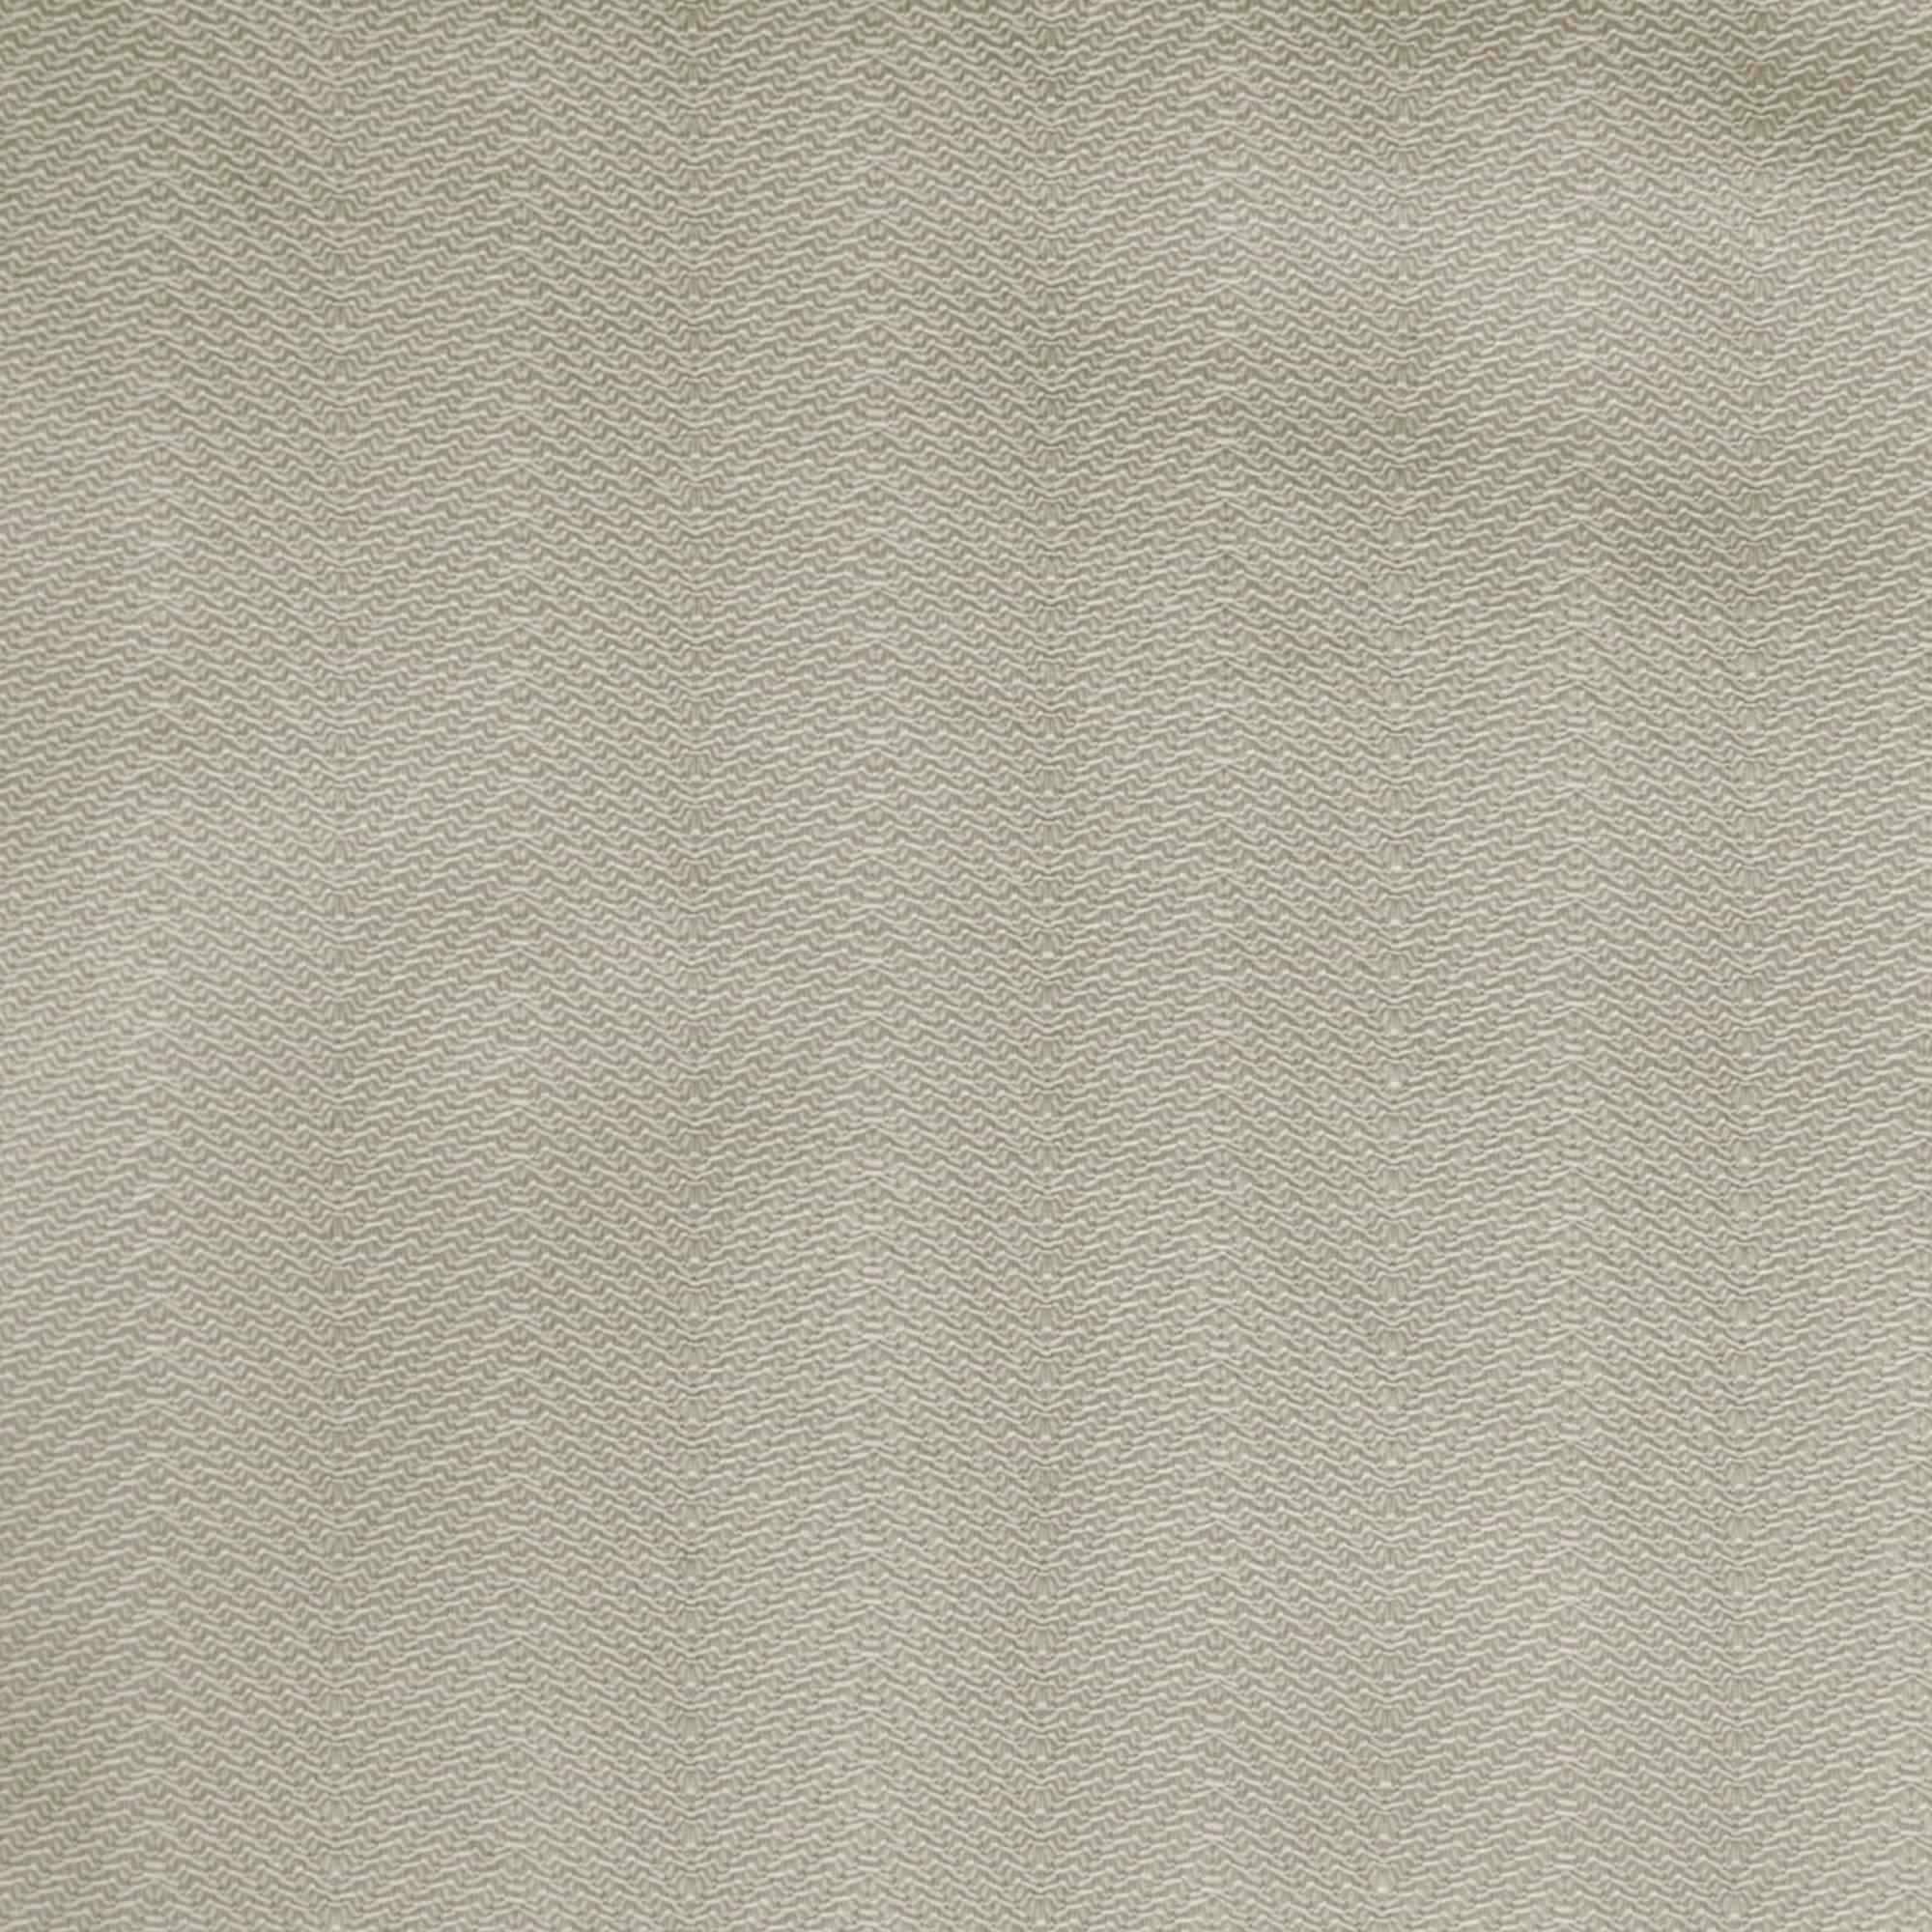 Details About Maytex Herringbone Ultimate Waterproof Fabric Shower Curtain